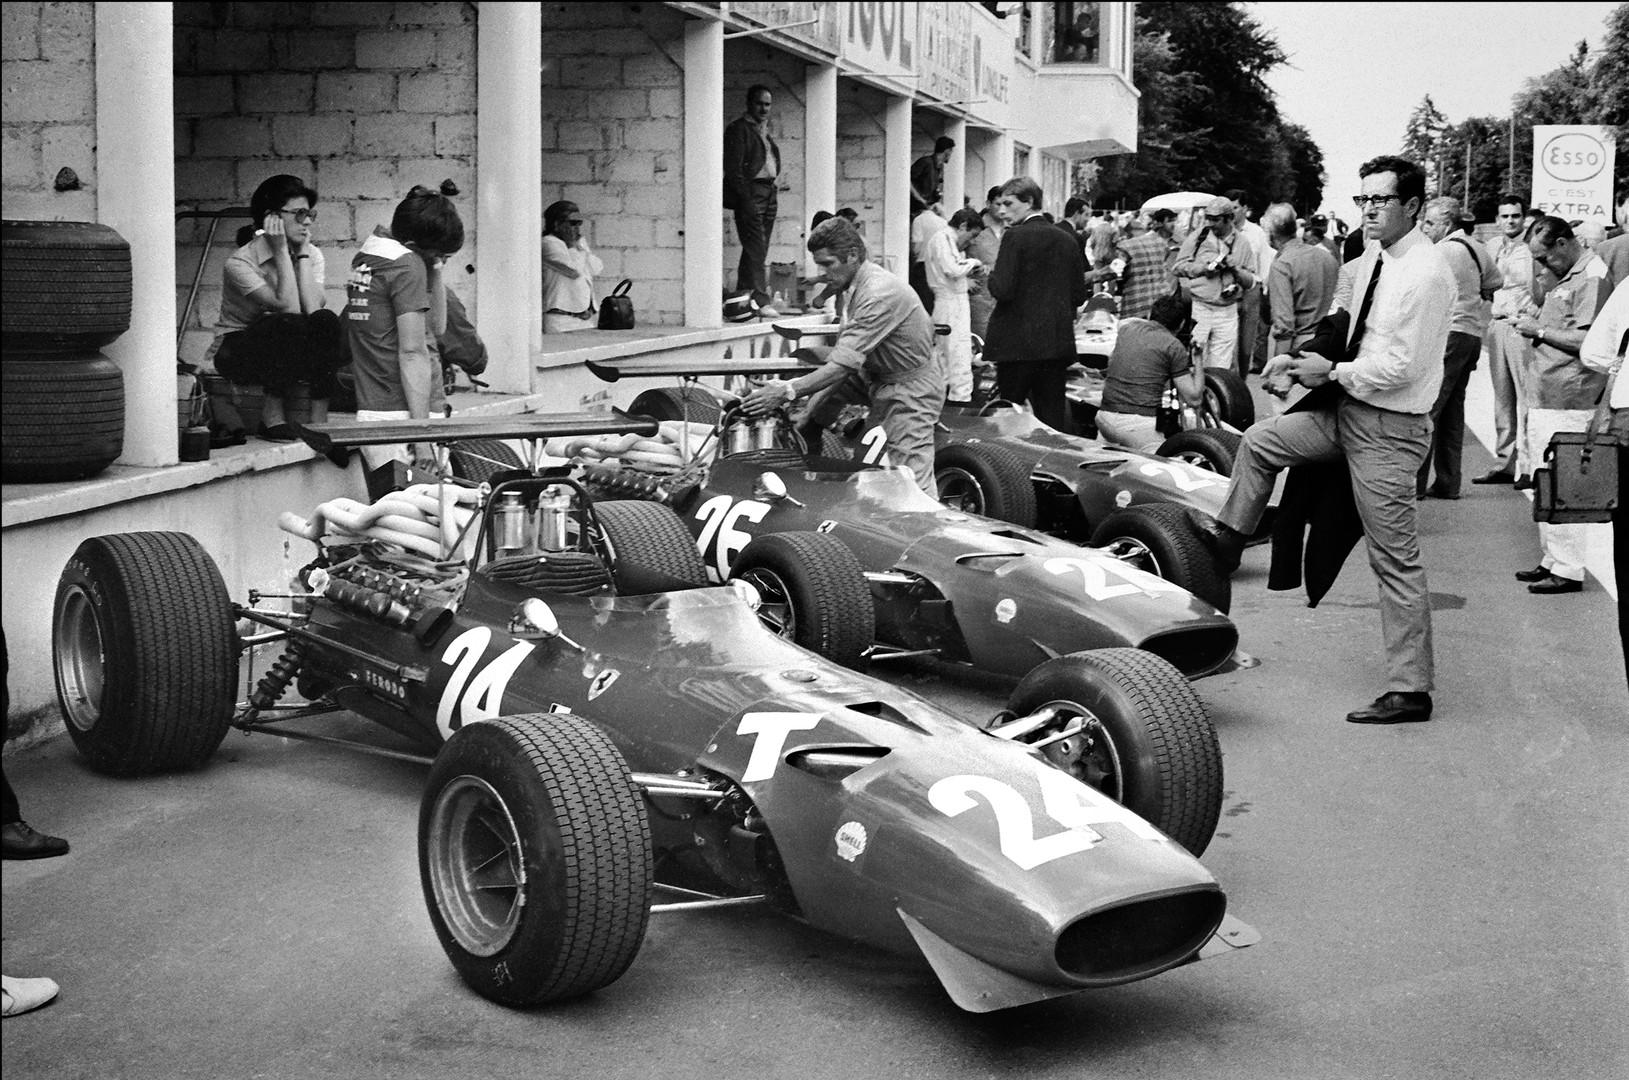 059 - Scuderia Ferrari.jpg